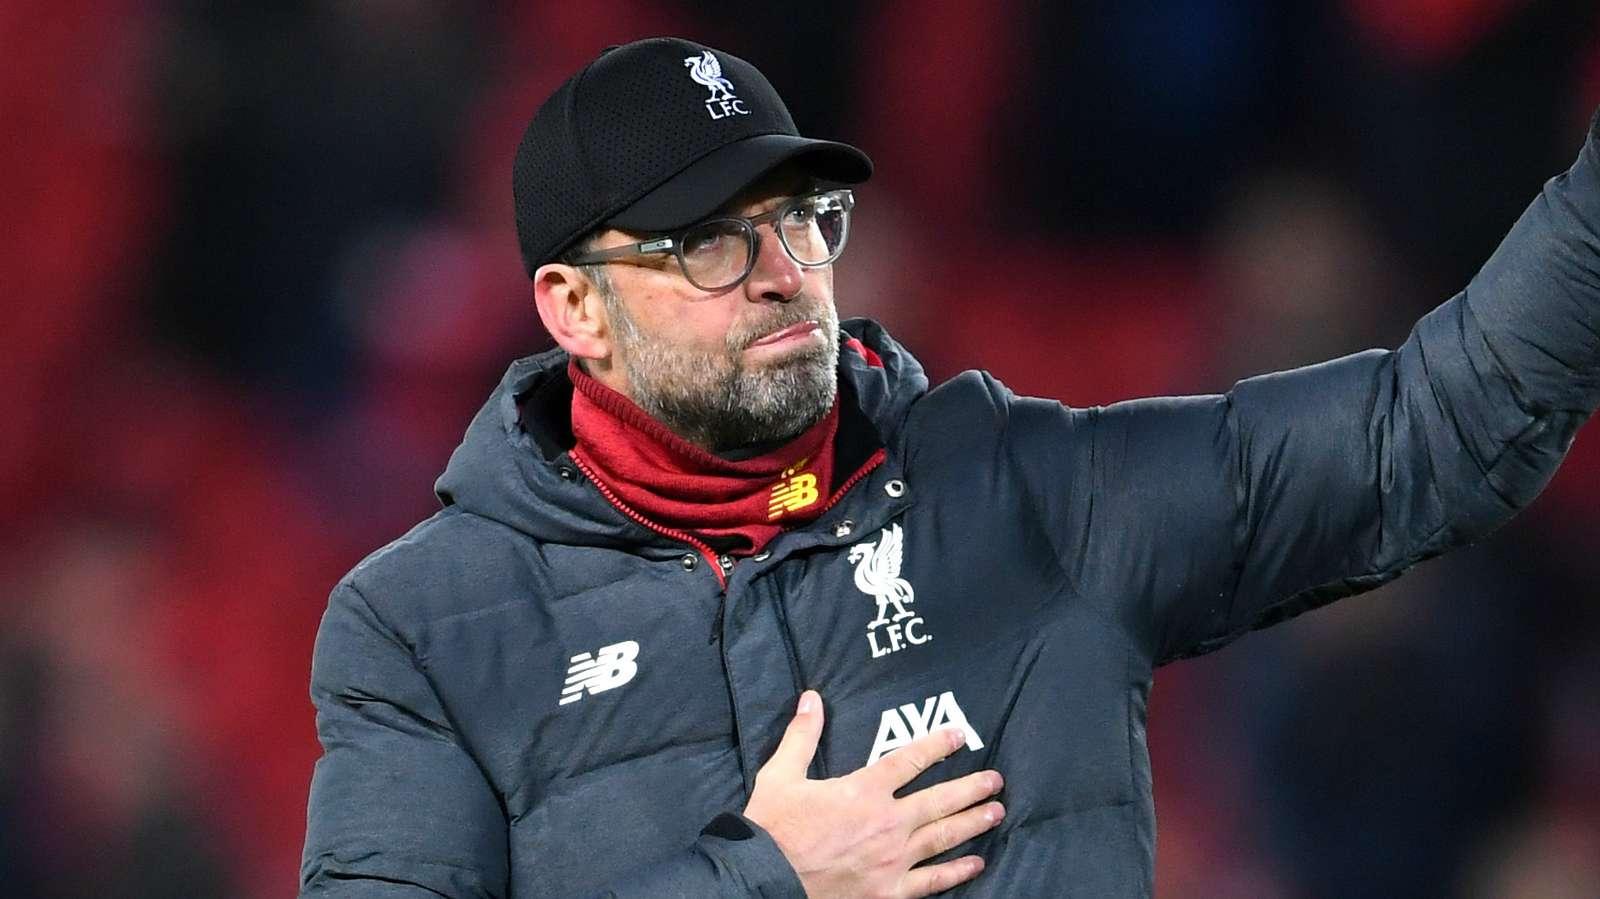 لیورپول-لیگ برتر انگلیس-آلمان-Liverpool-Premier League-Germany